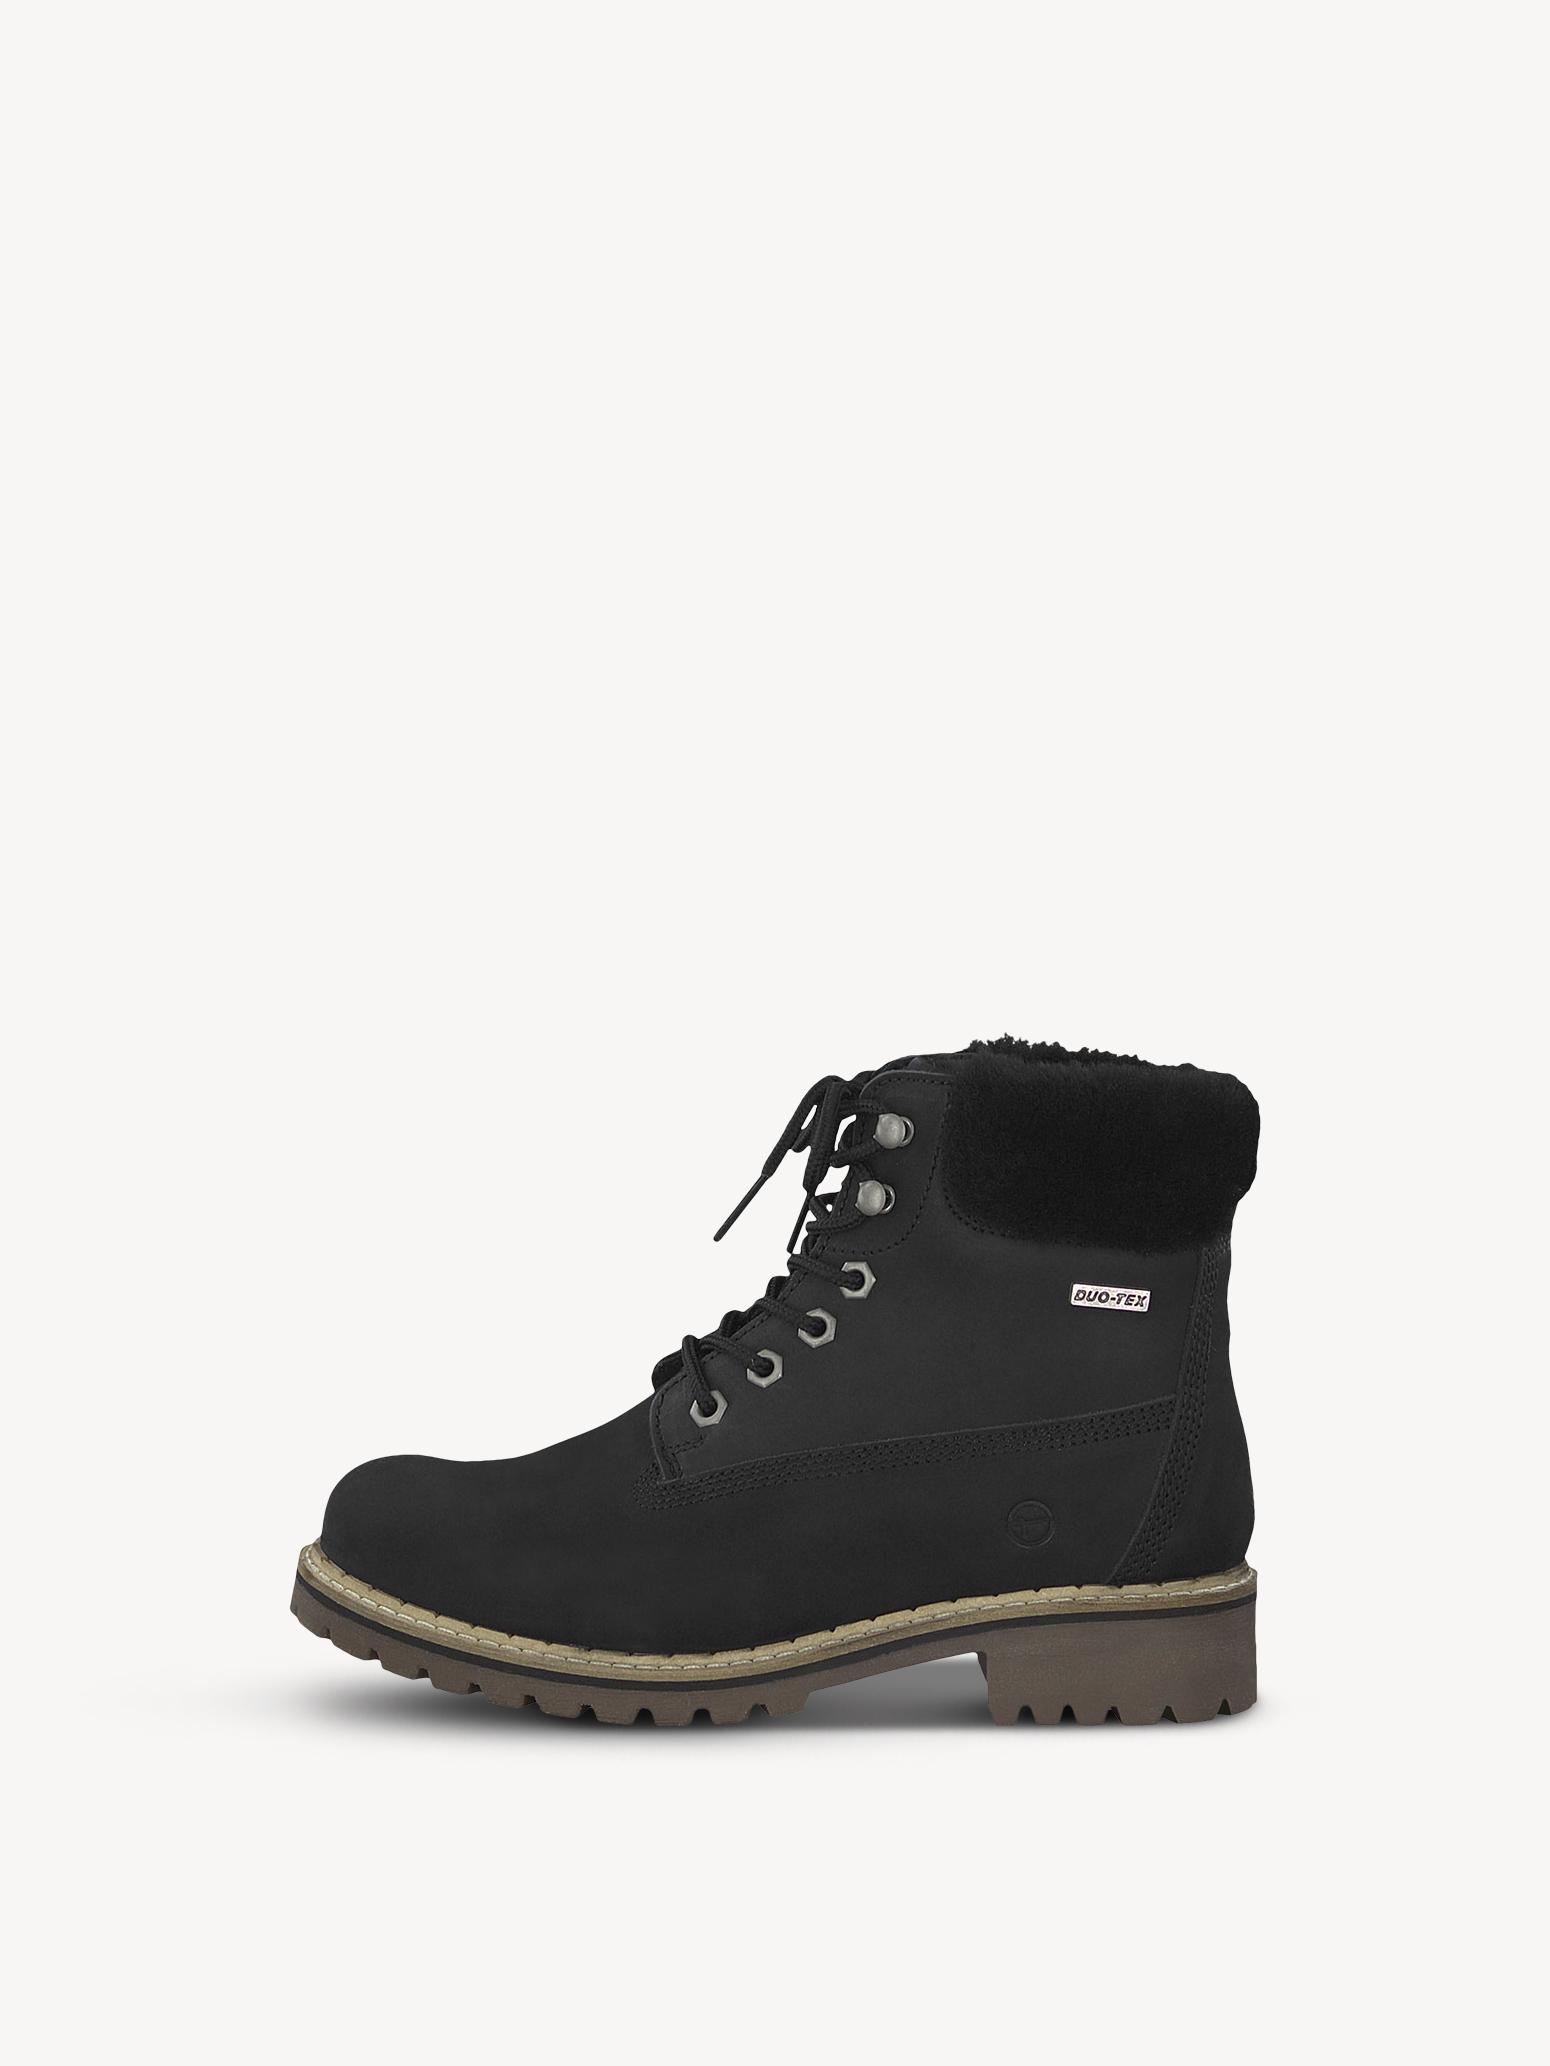 Tex Tamaris Stiefel Schuhe Tamaris Stiefel Tex Tamaris Schuhe L4A5Rj